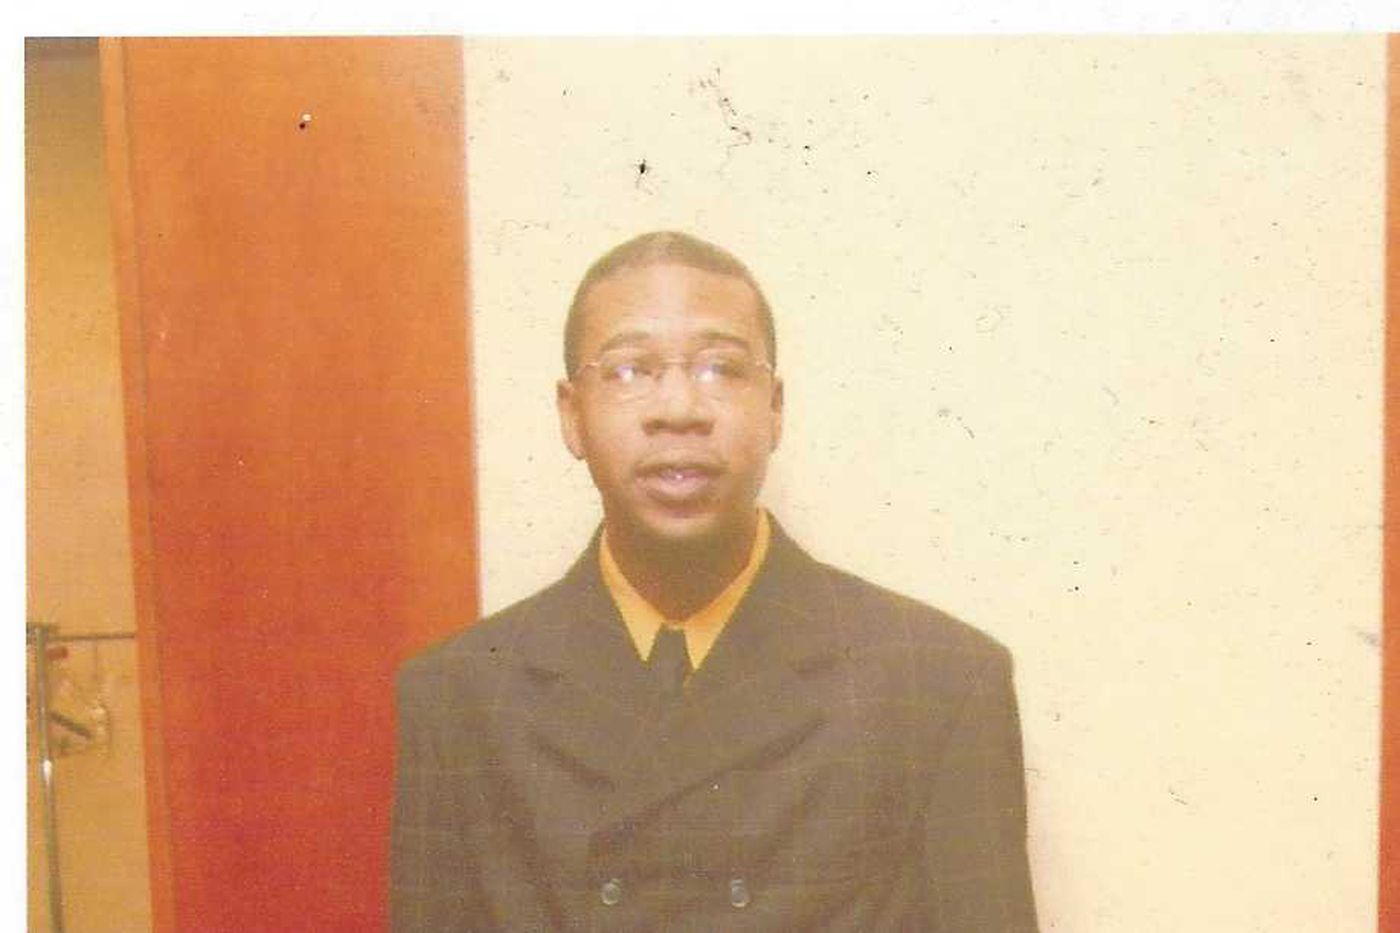 McKinley James Waites, a pharmacy technician, dies at 59